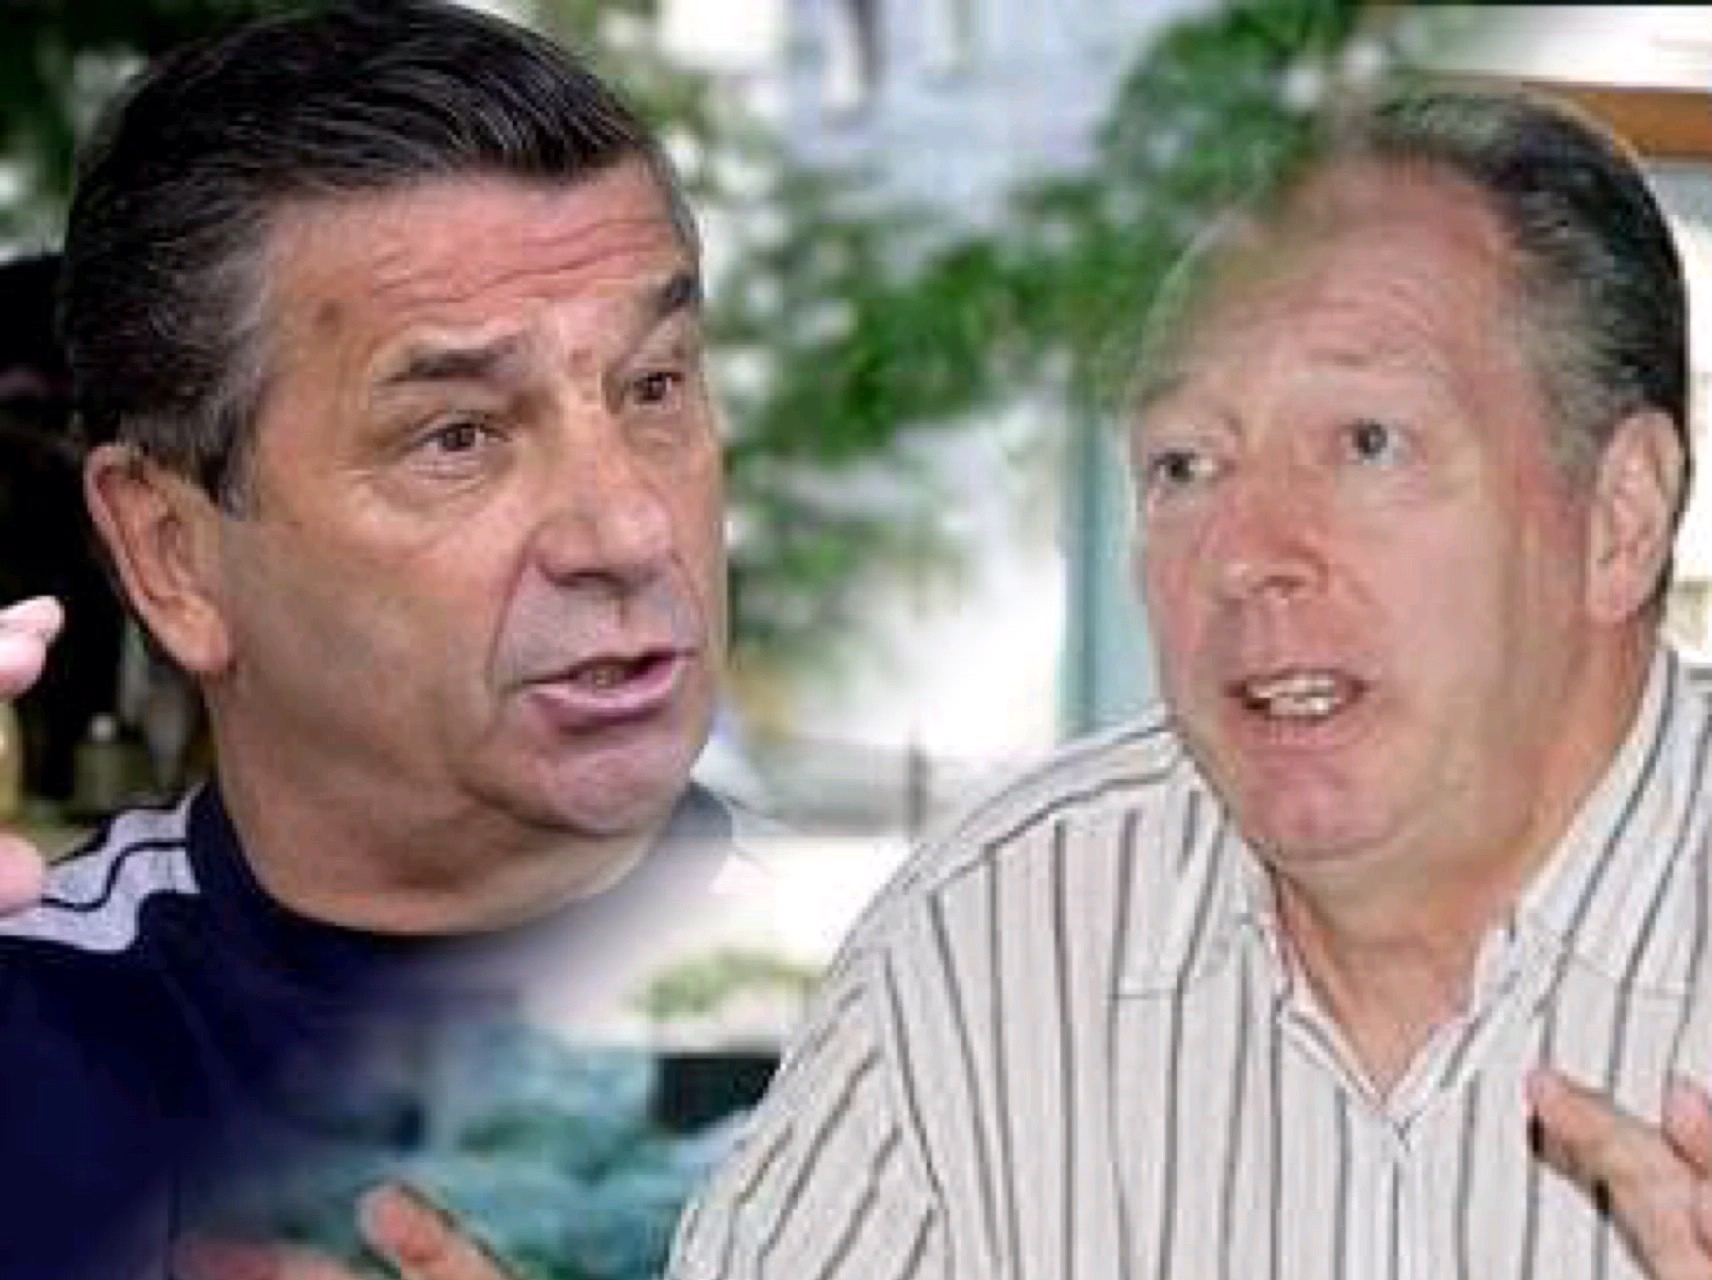 Westerhof, Bonfrere Jo Caution NFF Over Oliseh's Resignation